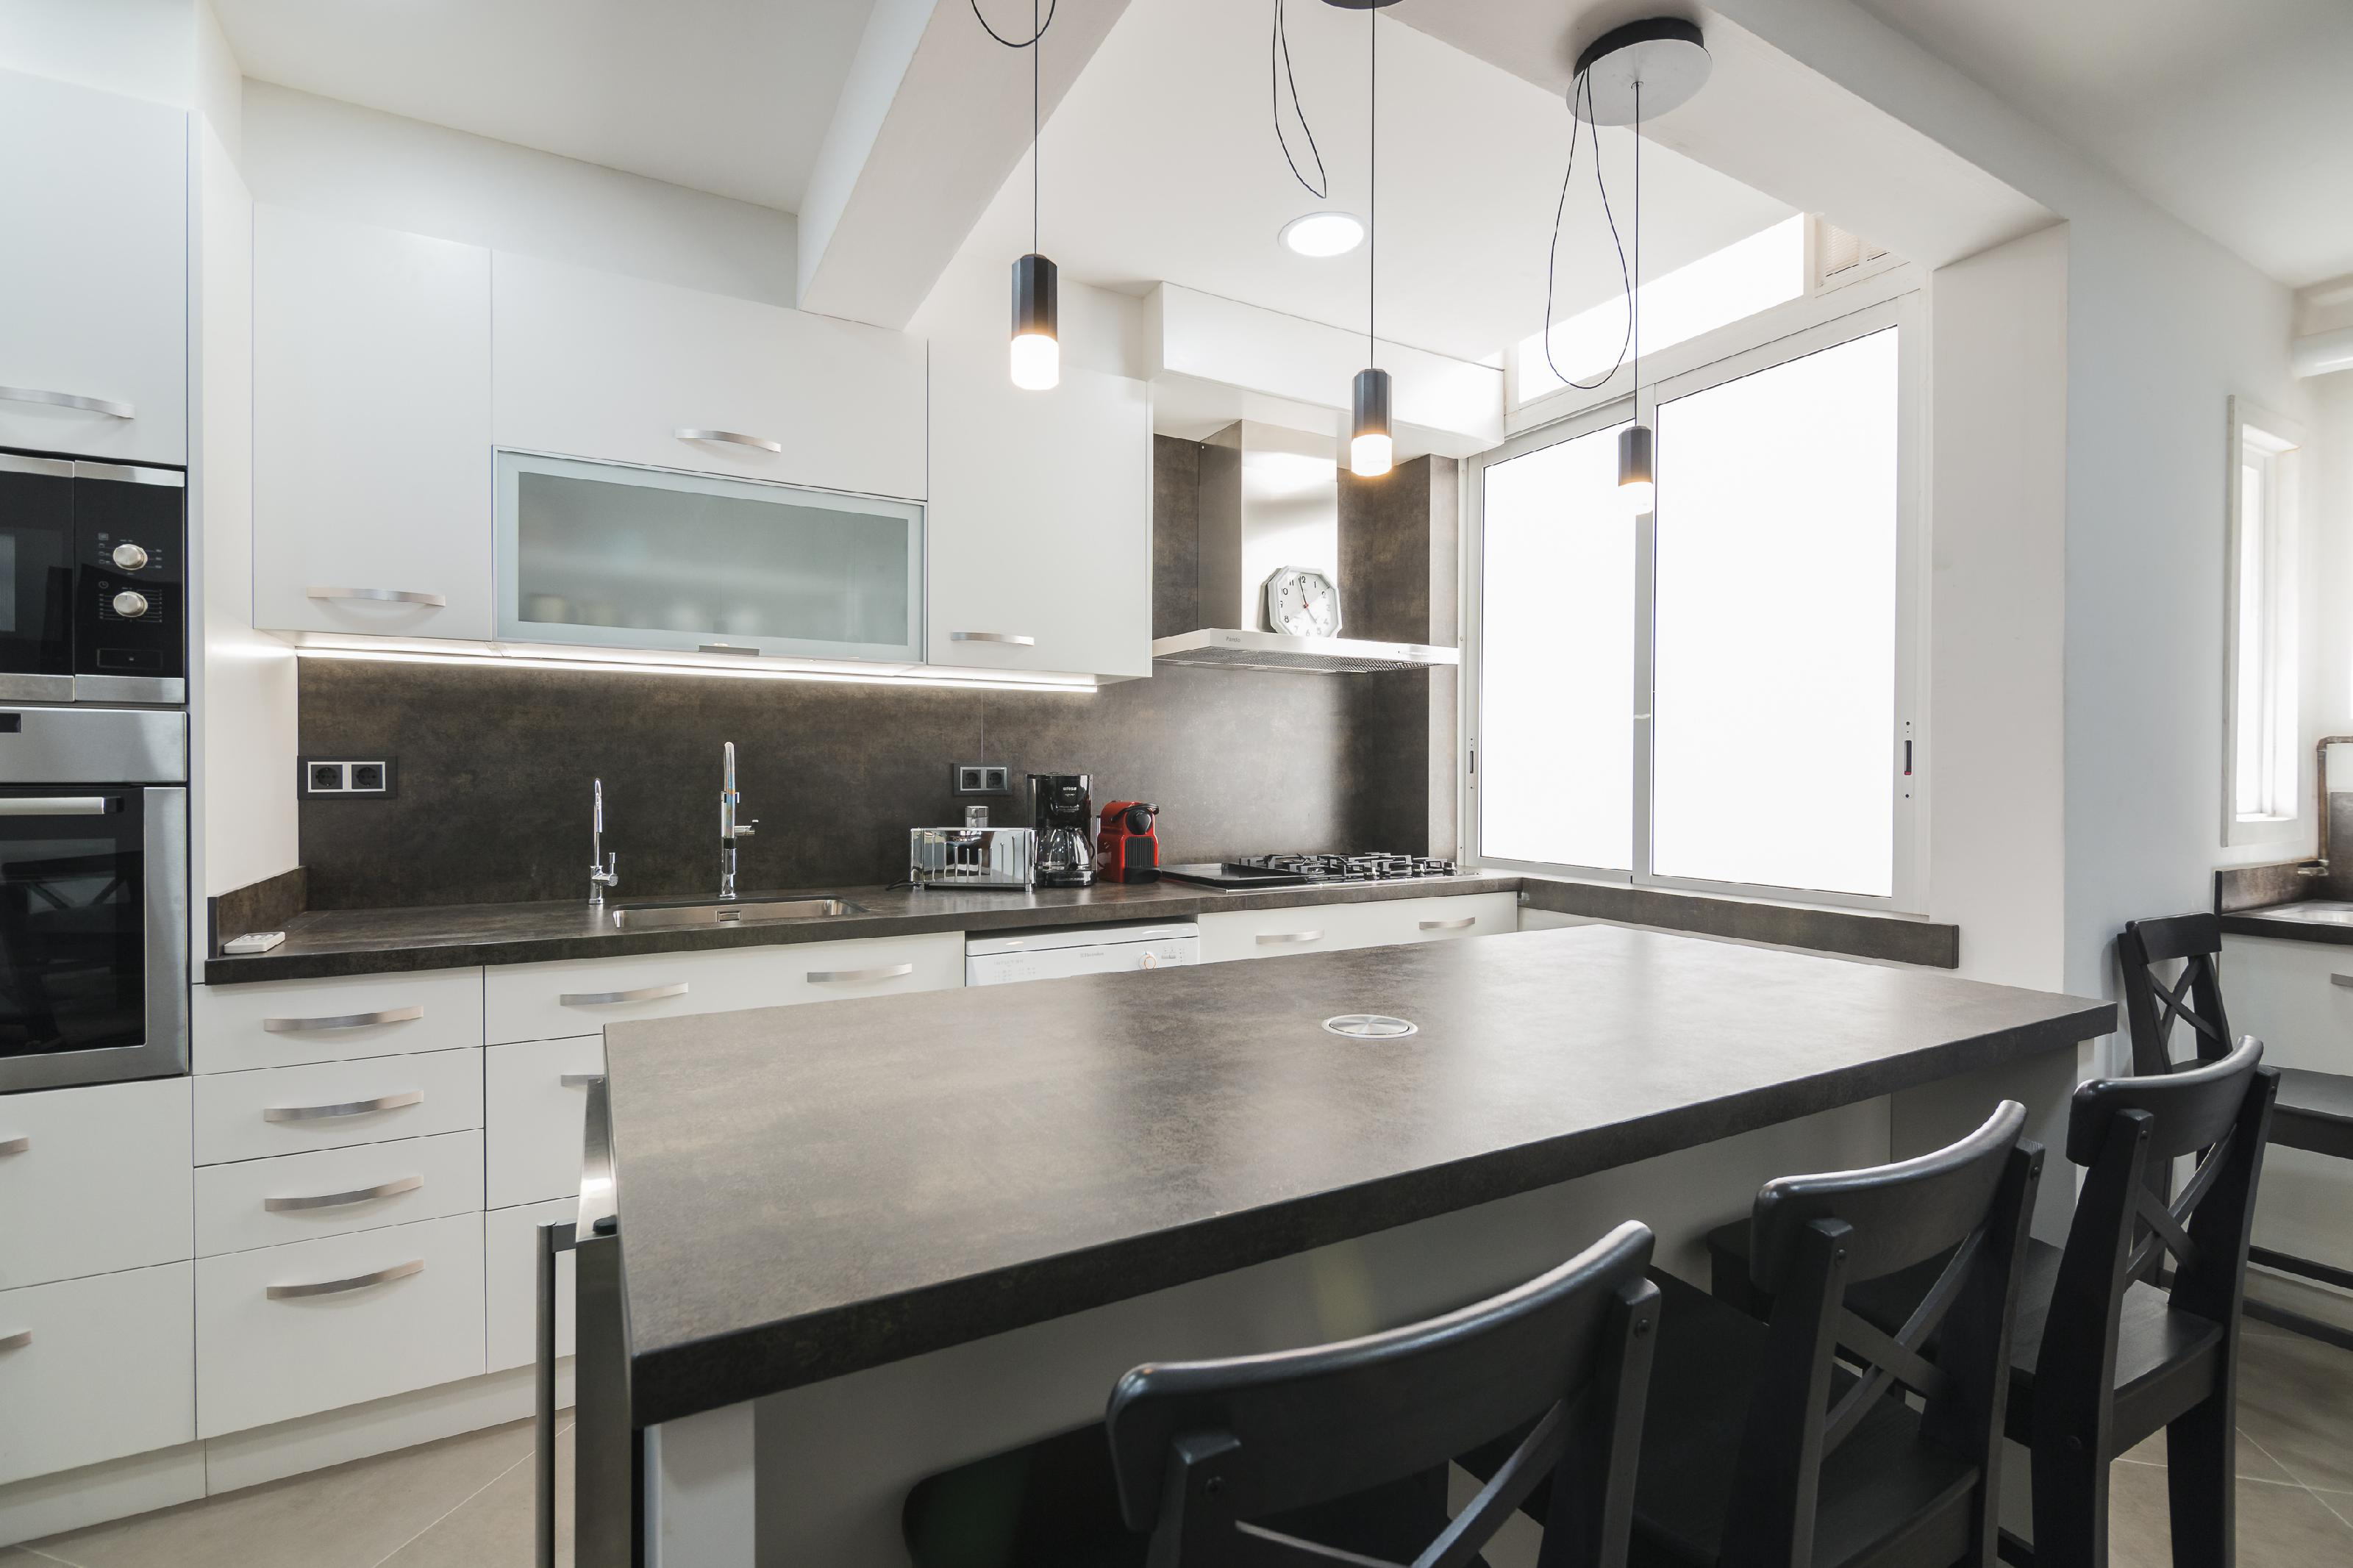 249856 Flat for sale in Sarrià-Sant Gervasi, Sant Gervasi-Galvany 15